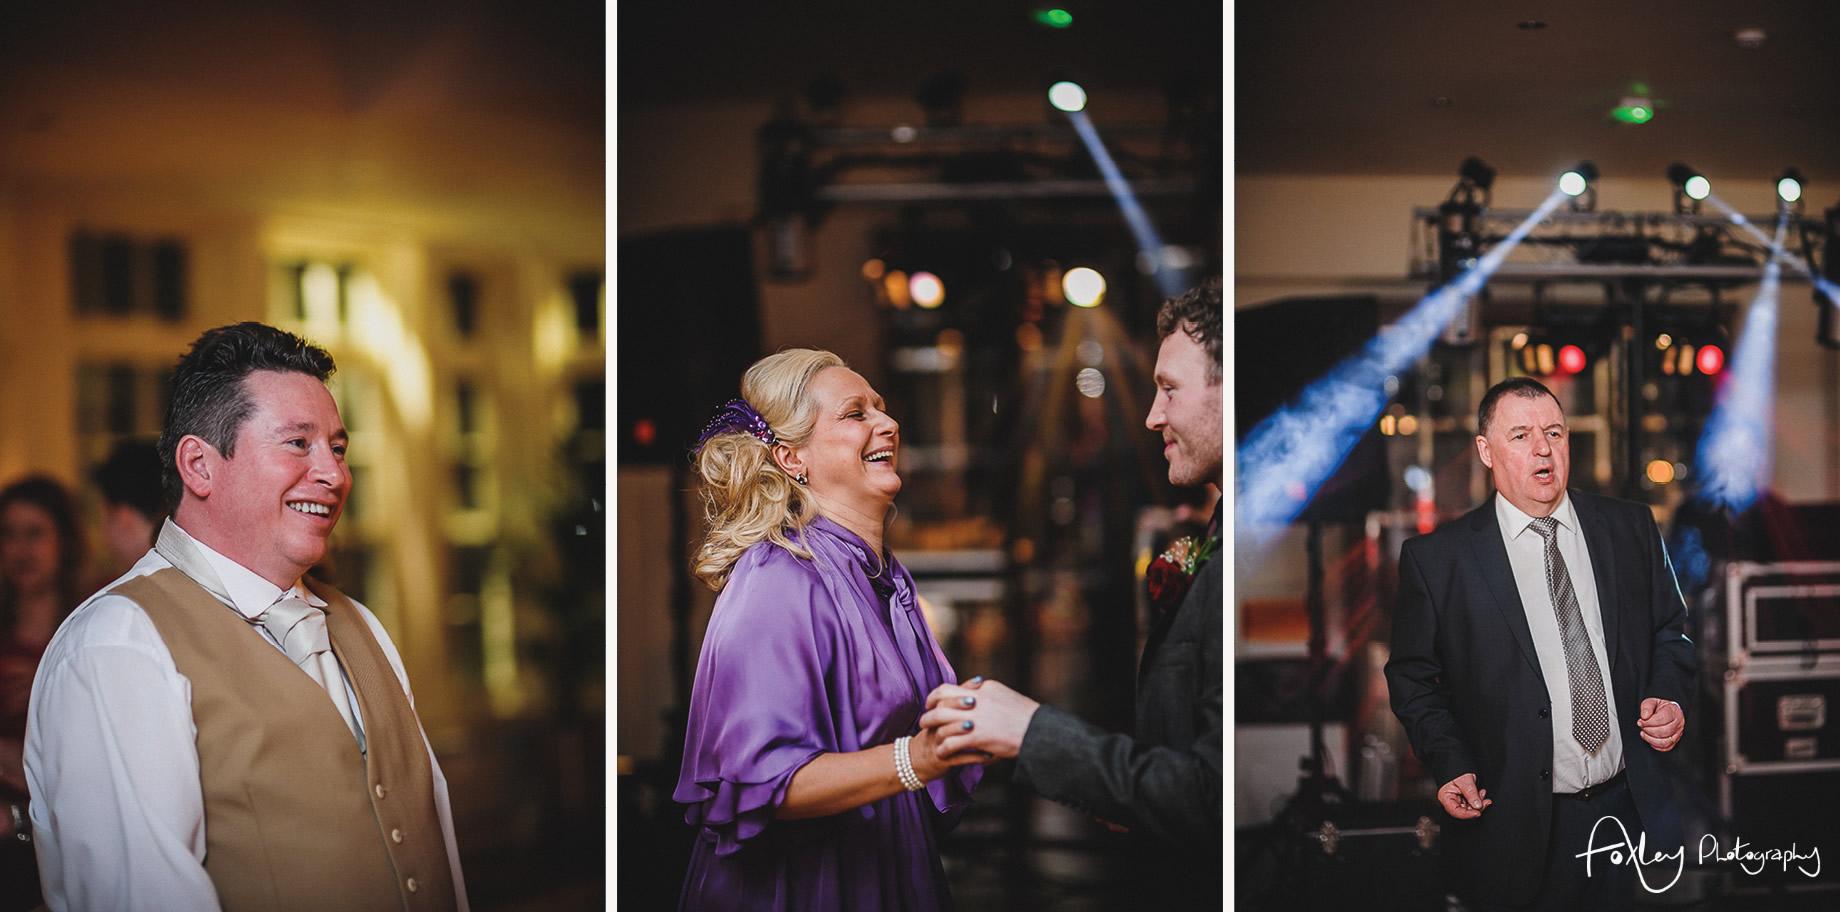 Gemma and Lewis' Wedding at Mitton Hall 171